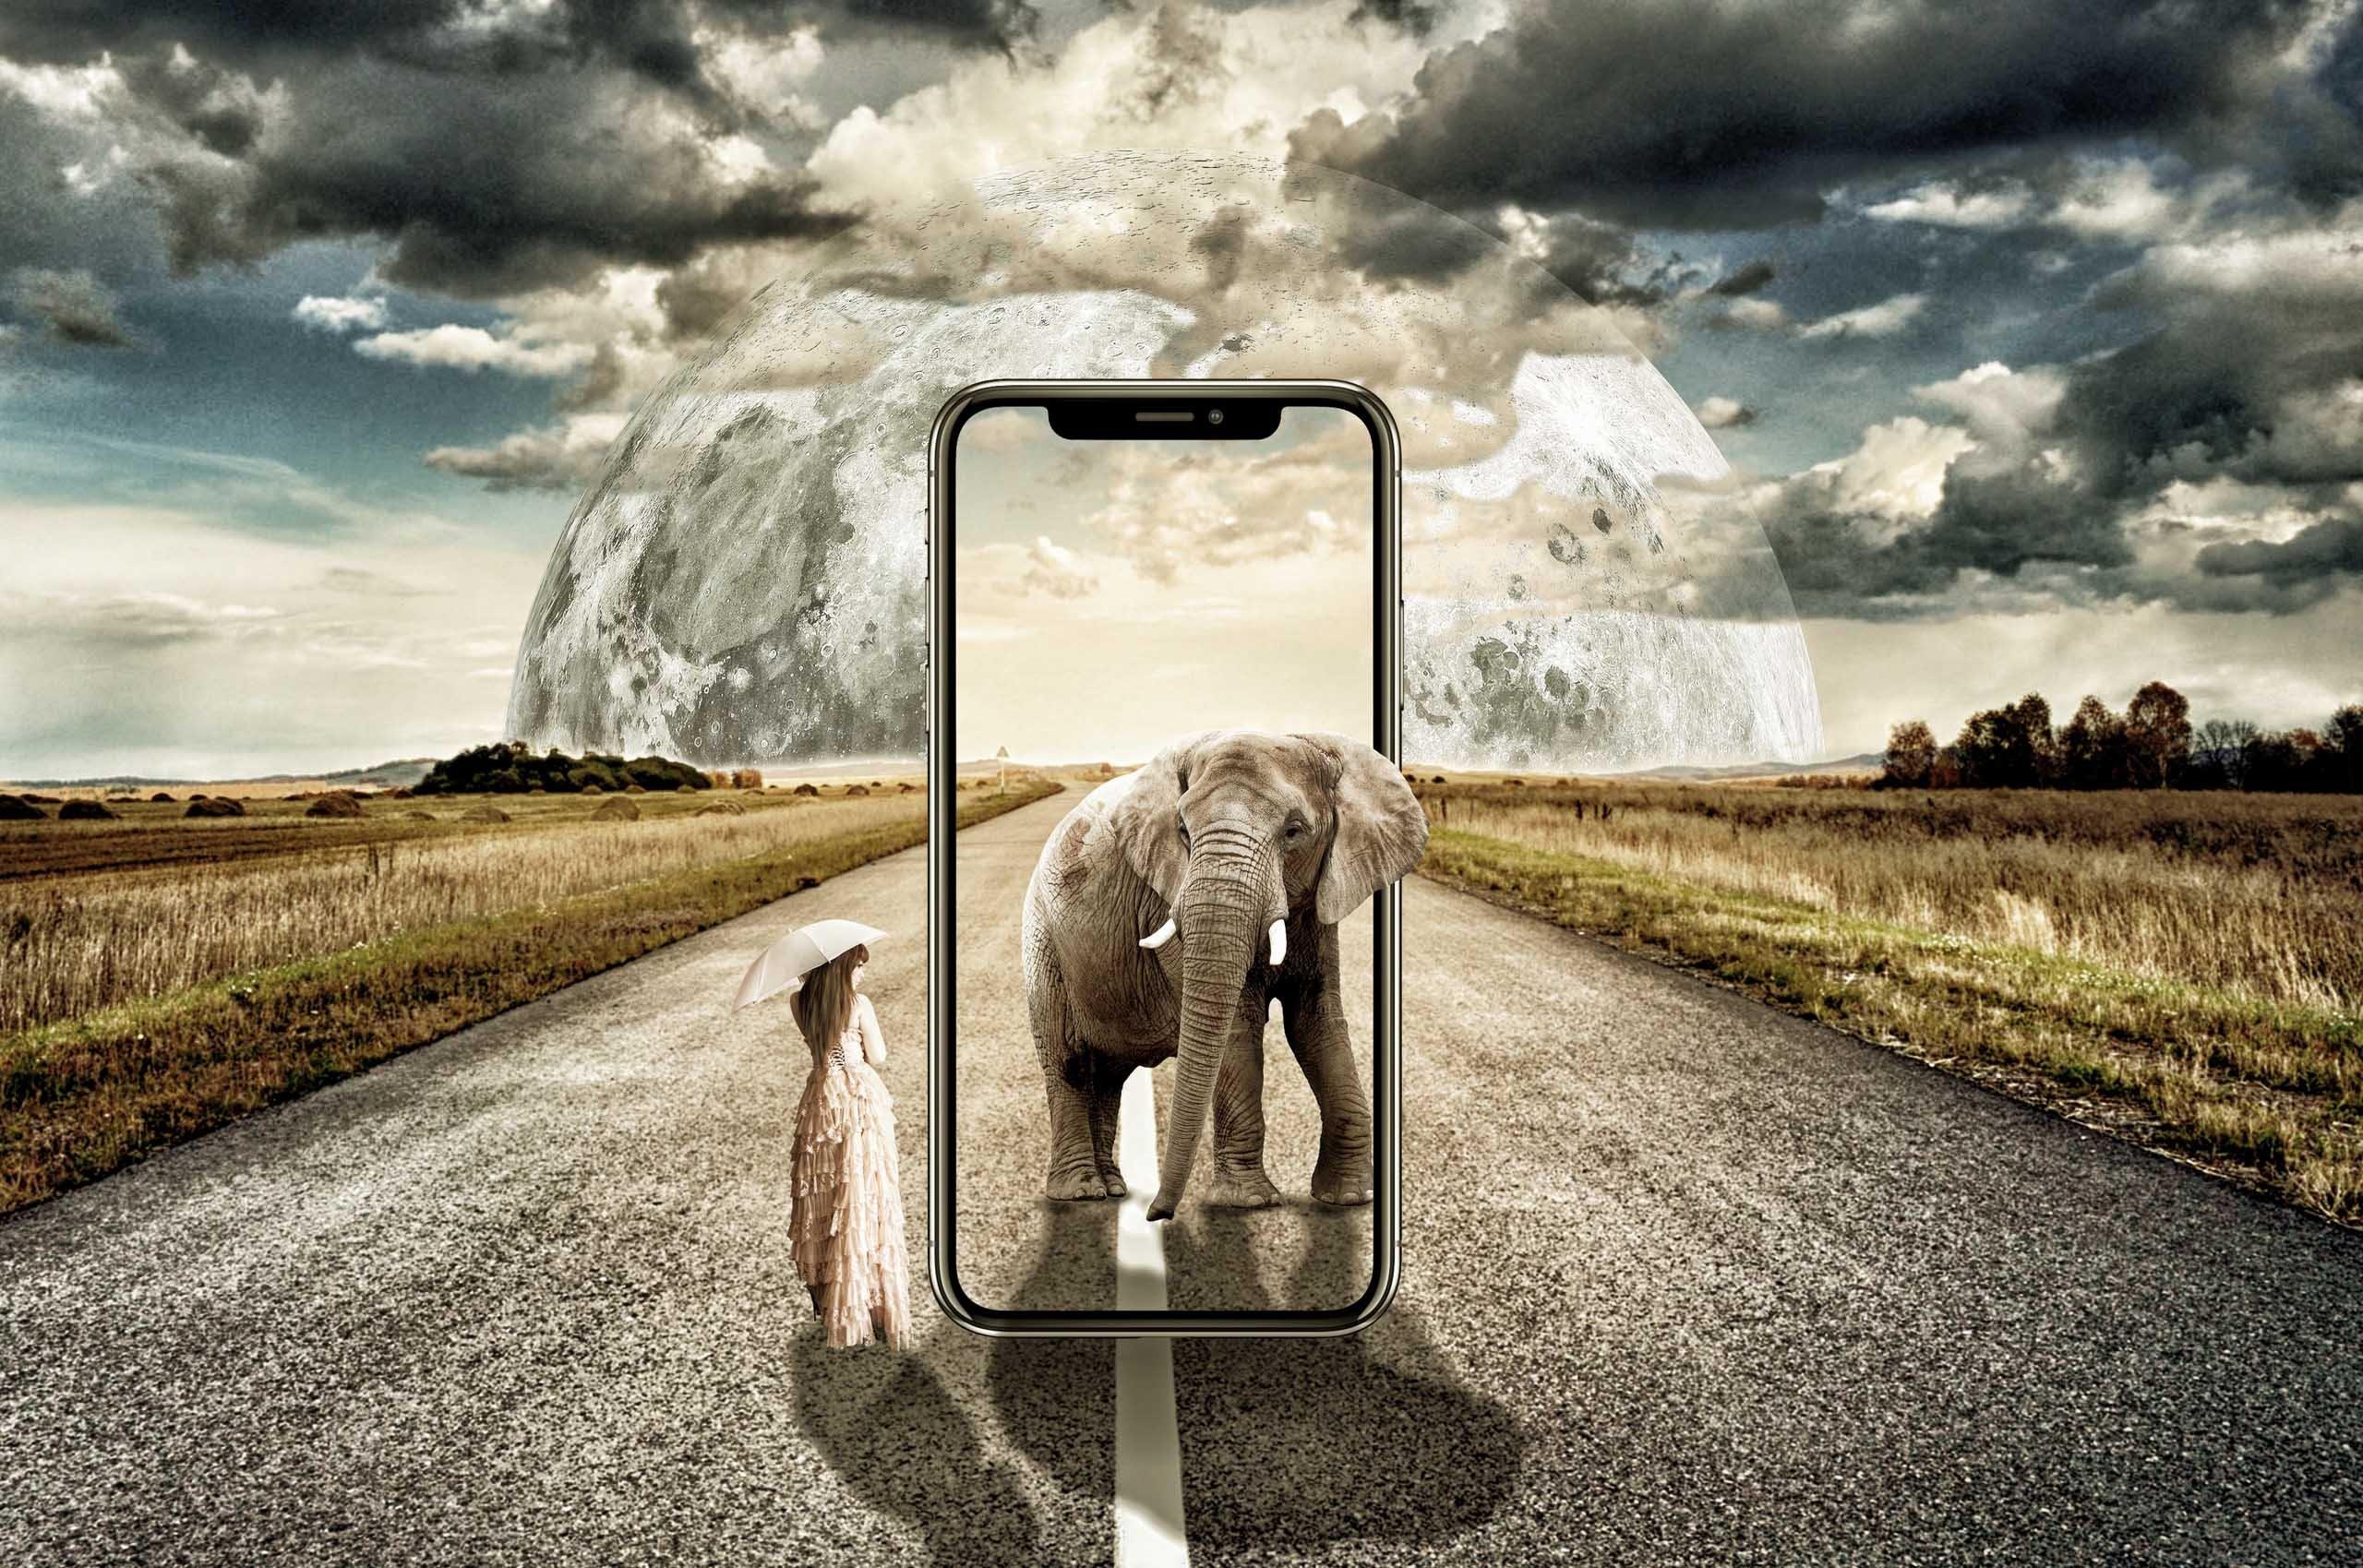 AMM | Introdurre piattaforme tecnologiche moderne